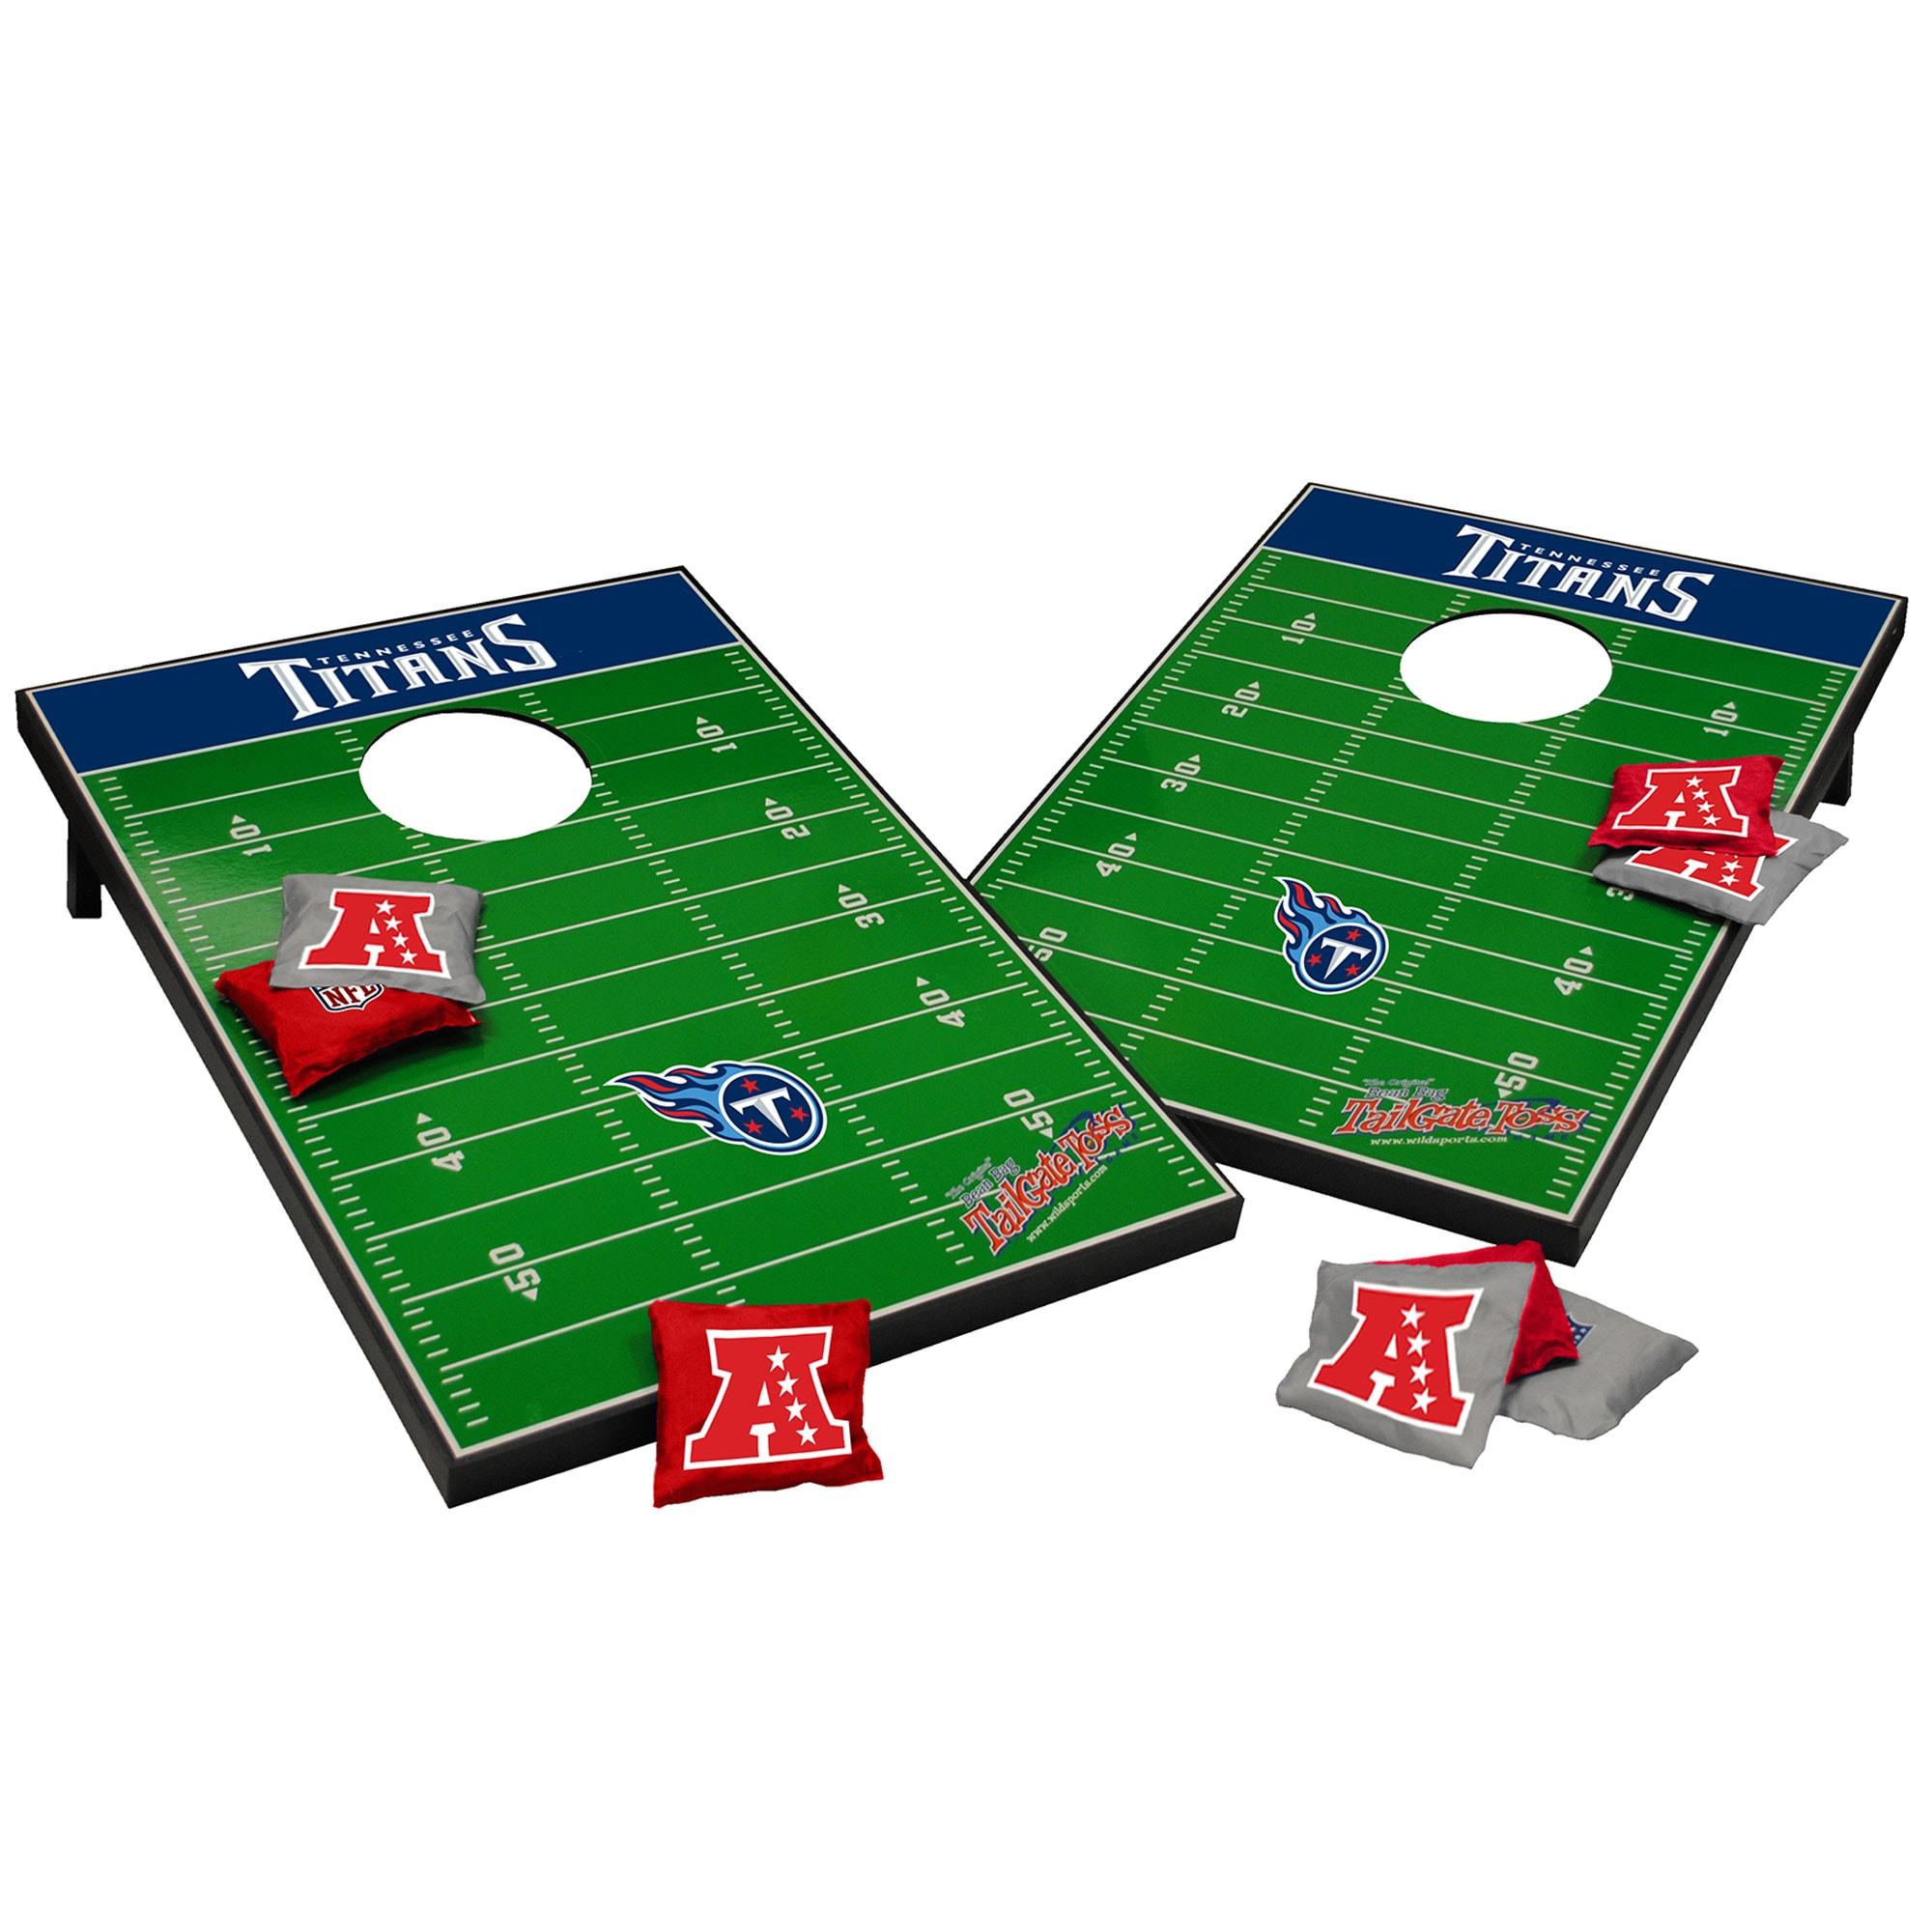 Tennessee Titans 2' x 3' Cornhole Board Tailgate Toss Set